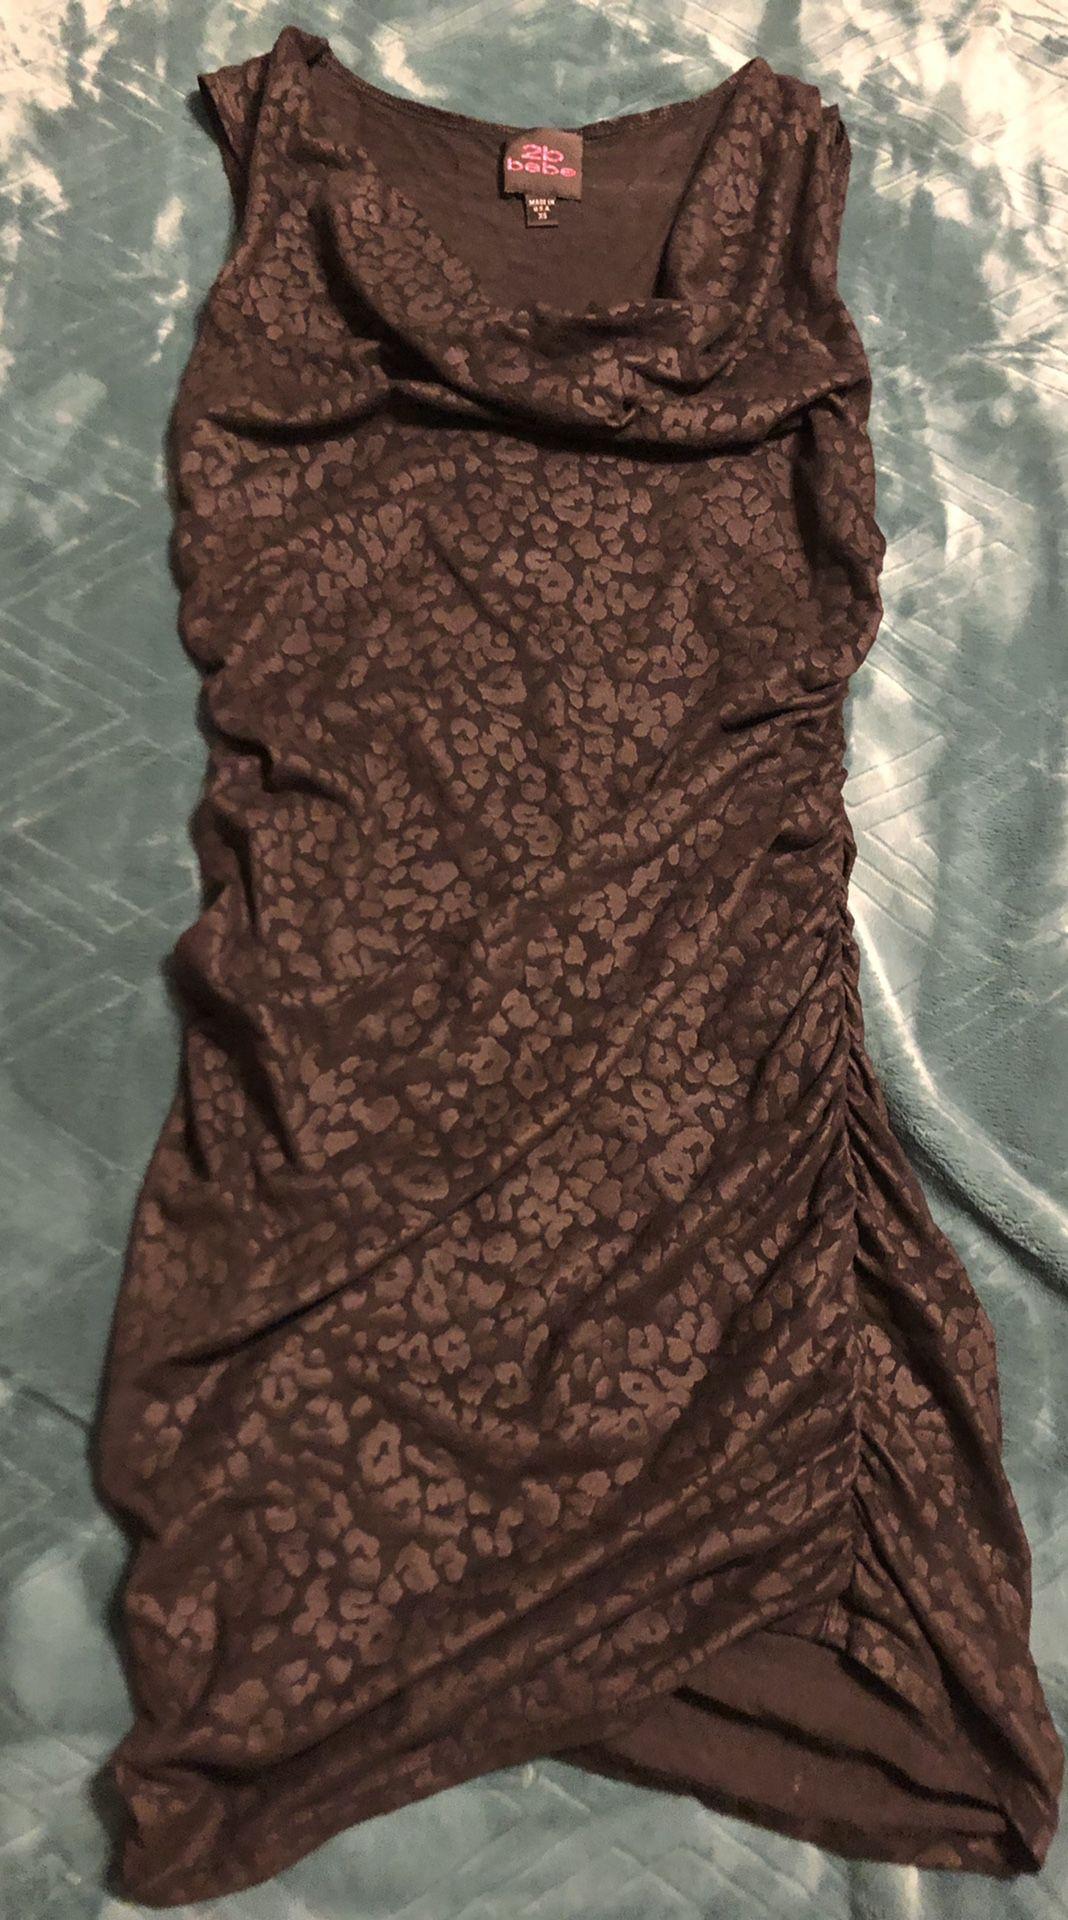 **FLASH SALE** 2B Bebe Black Dress XS